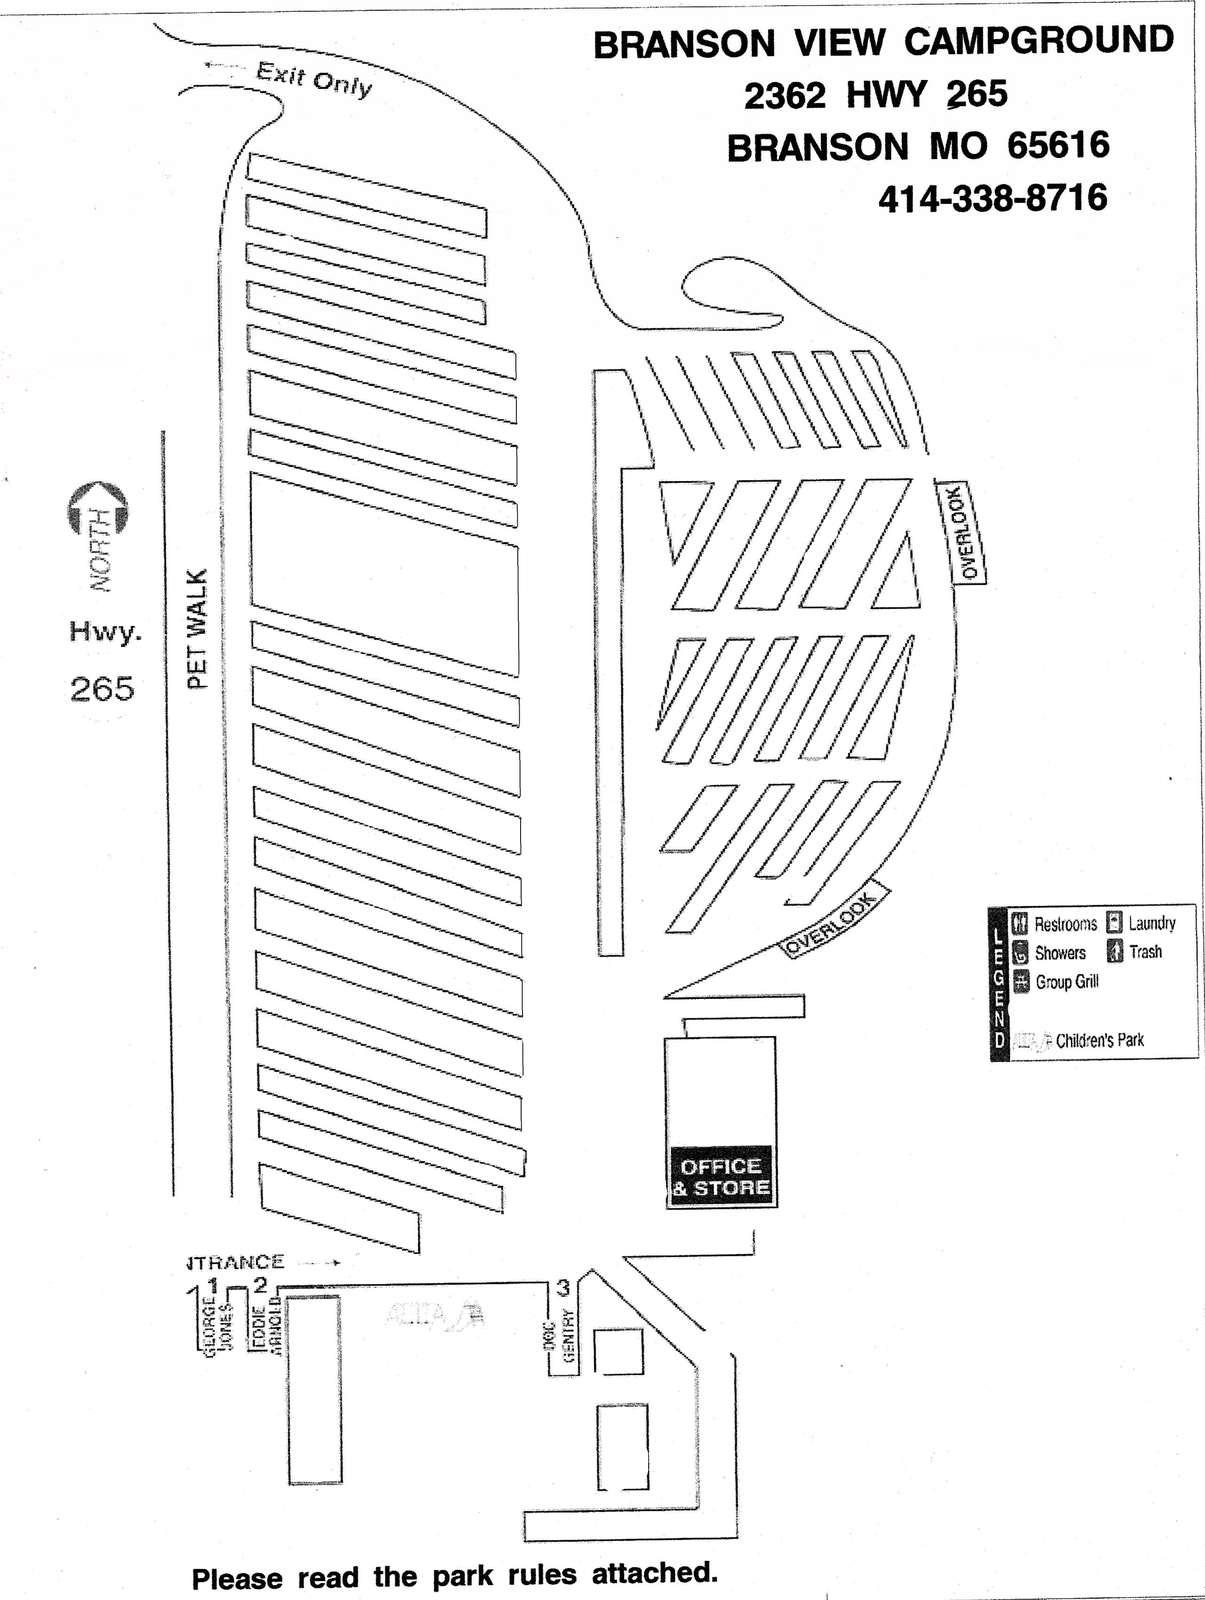 BVC-#21-36FT-PULL THROUGH - property